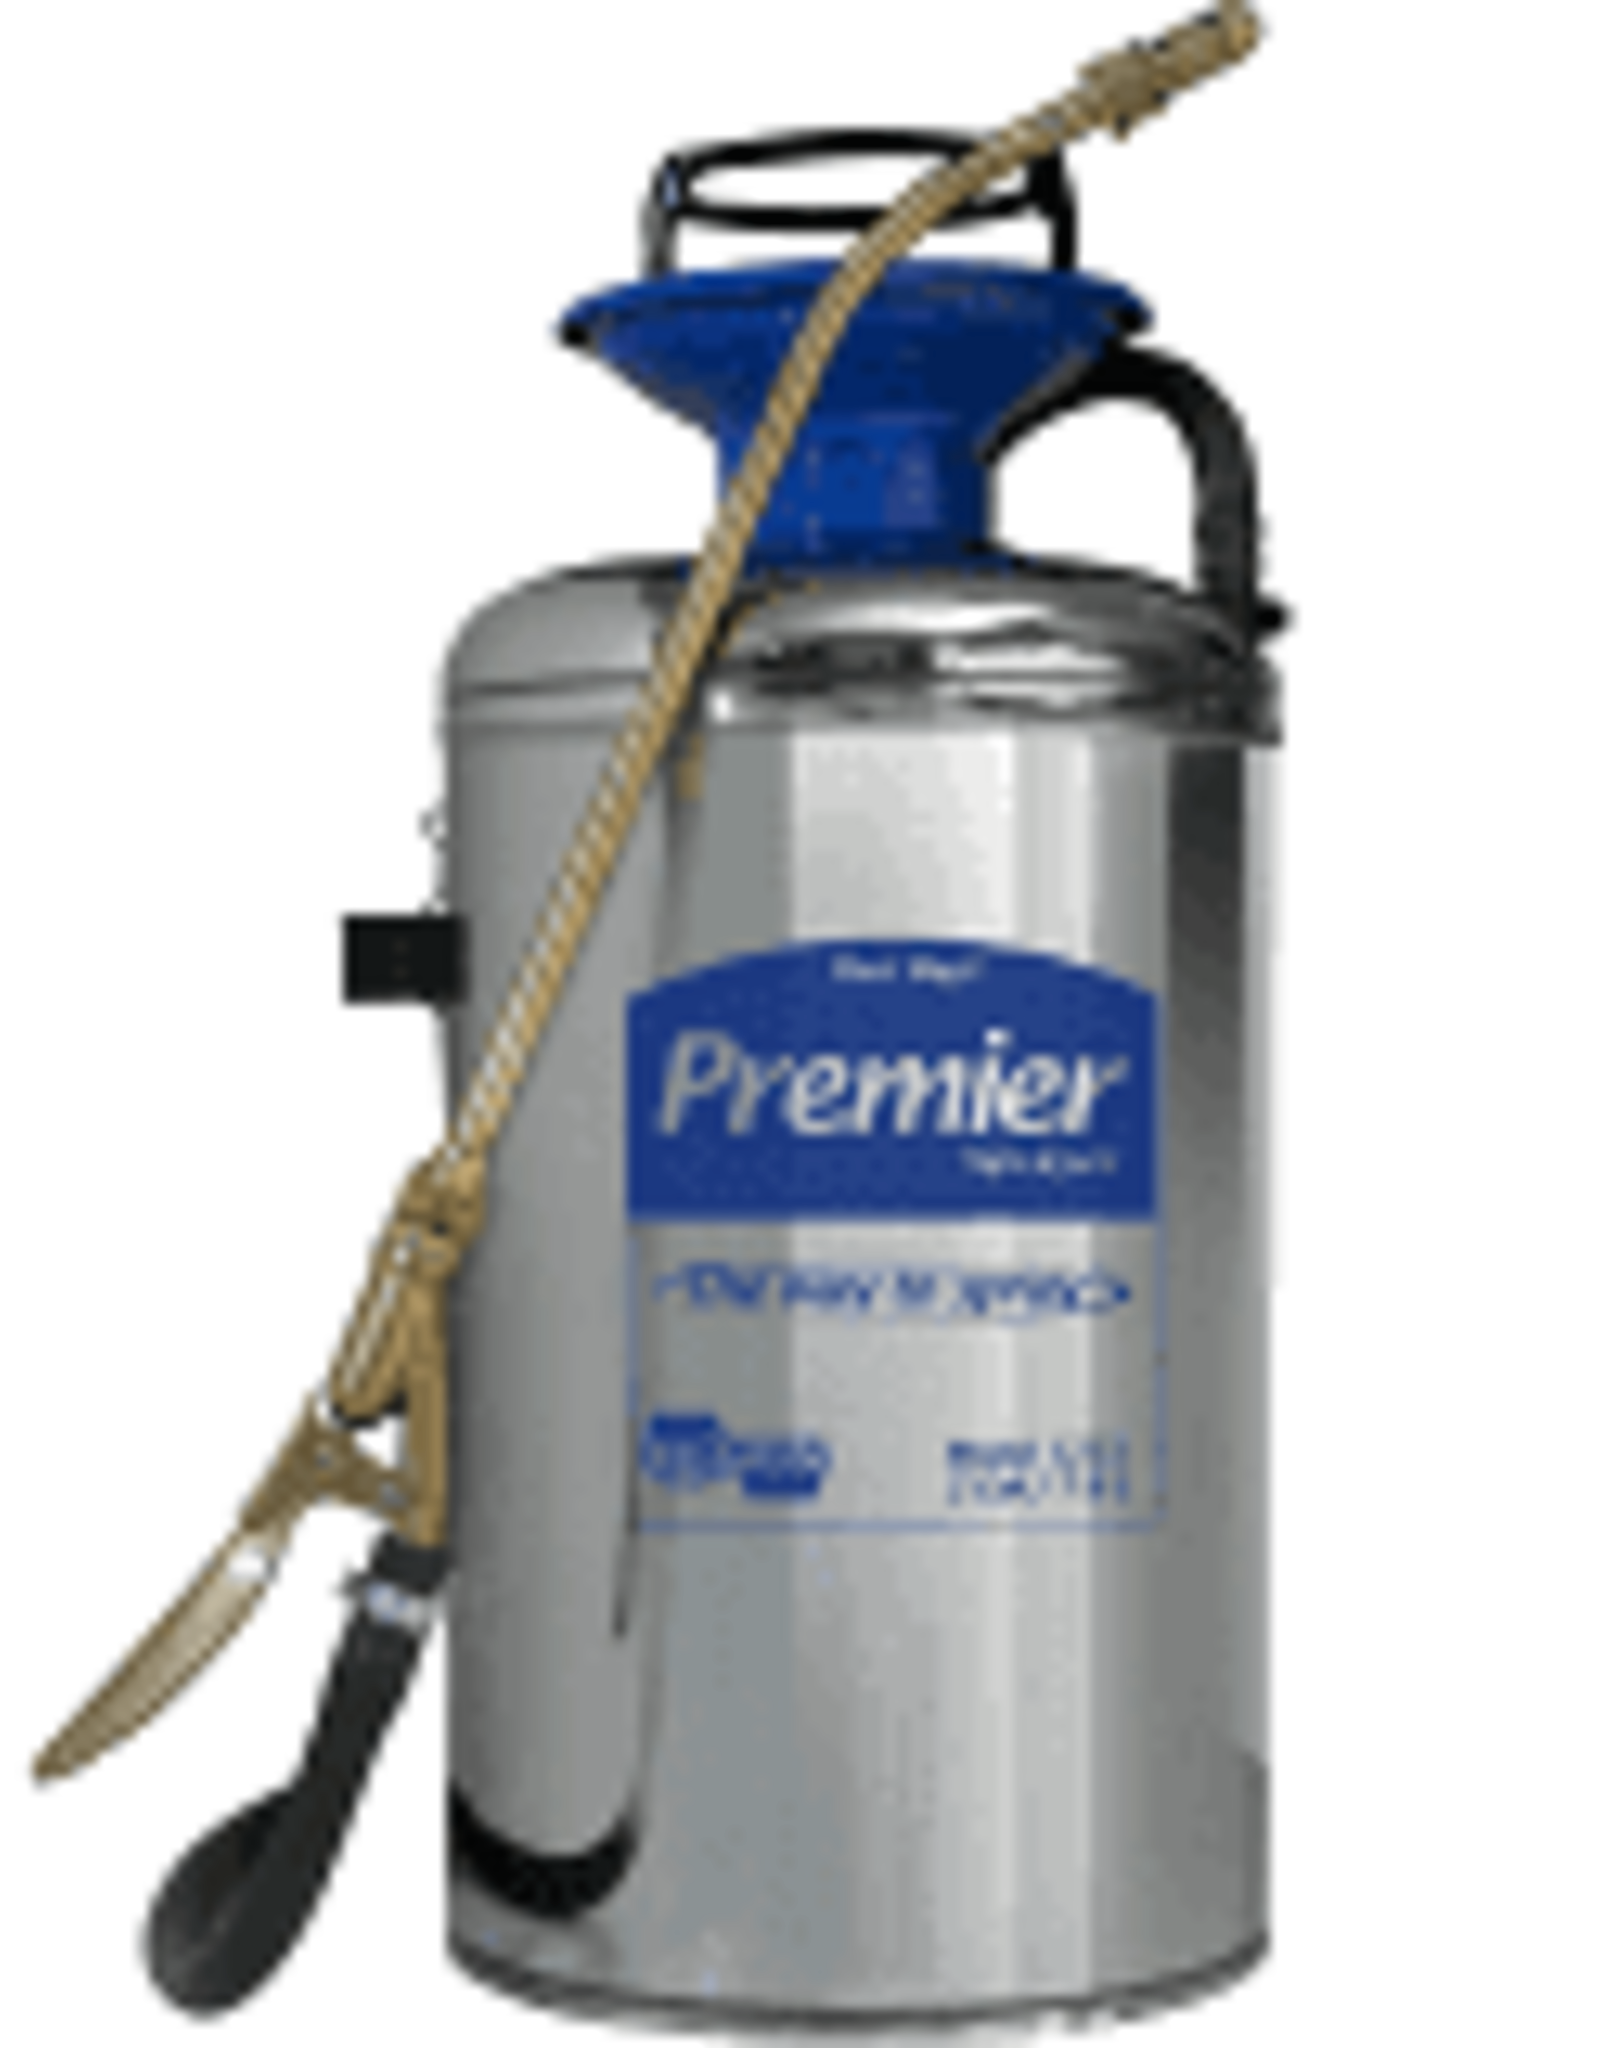 Chapin Chapin Premier Sprayer 2 gal